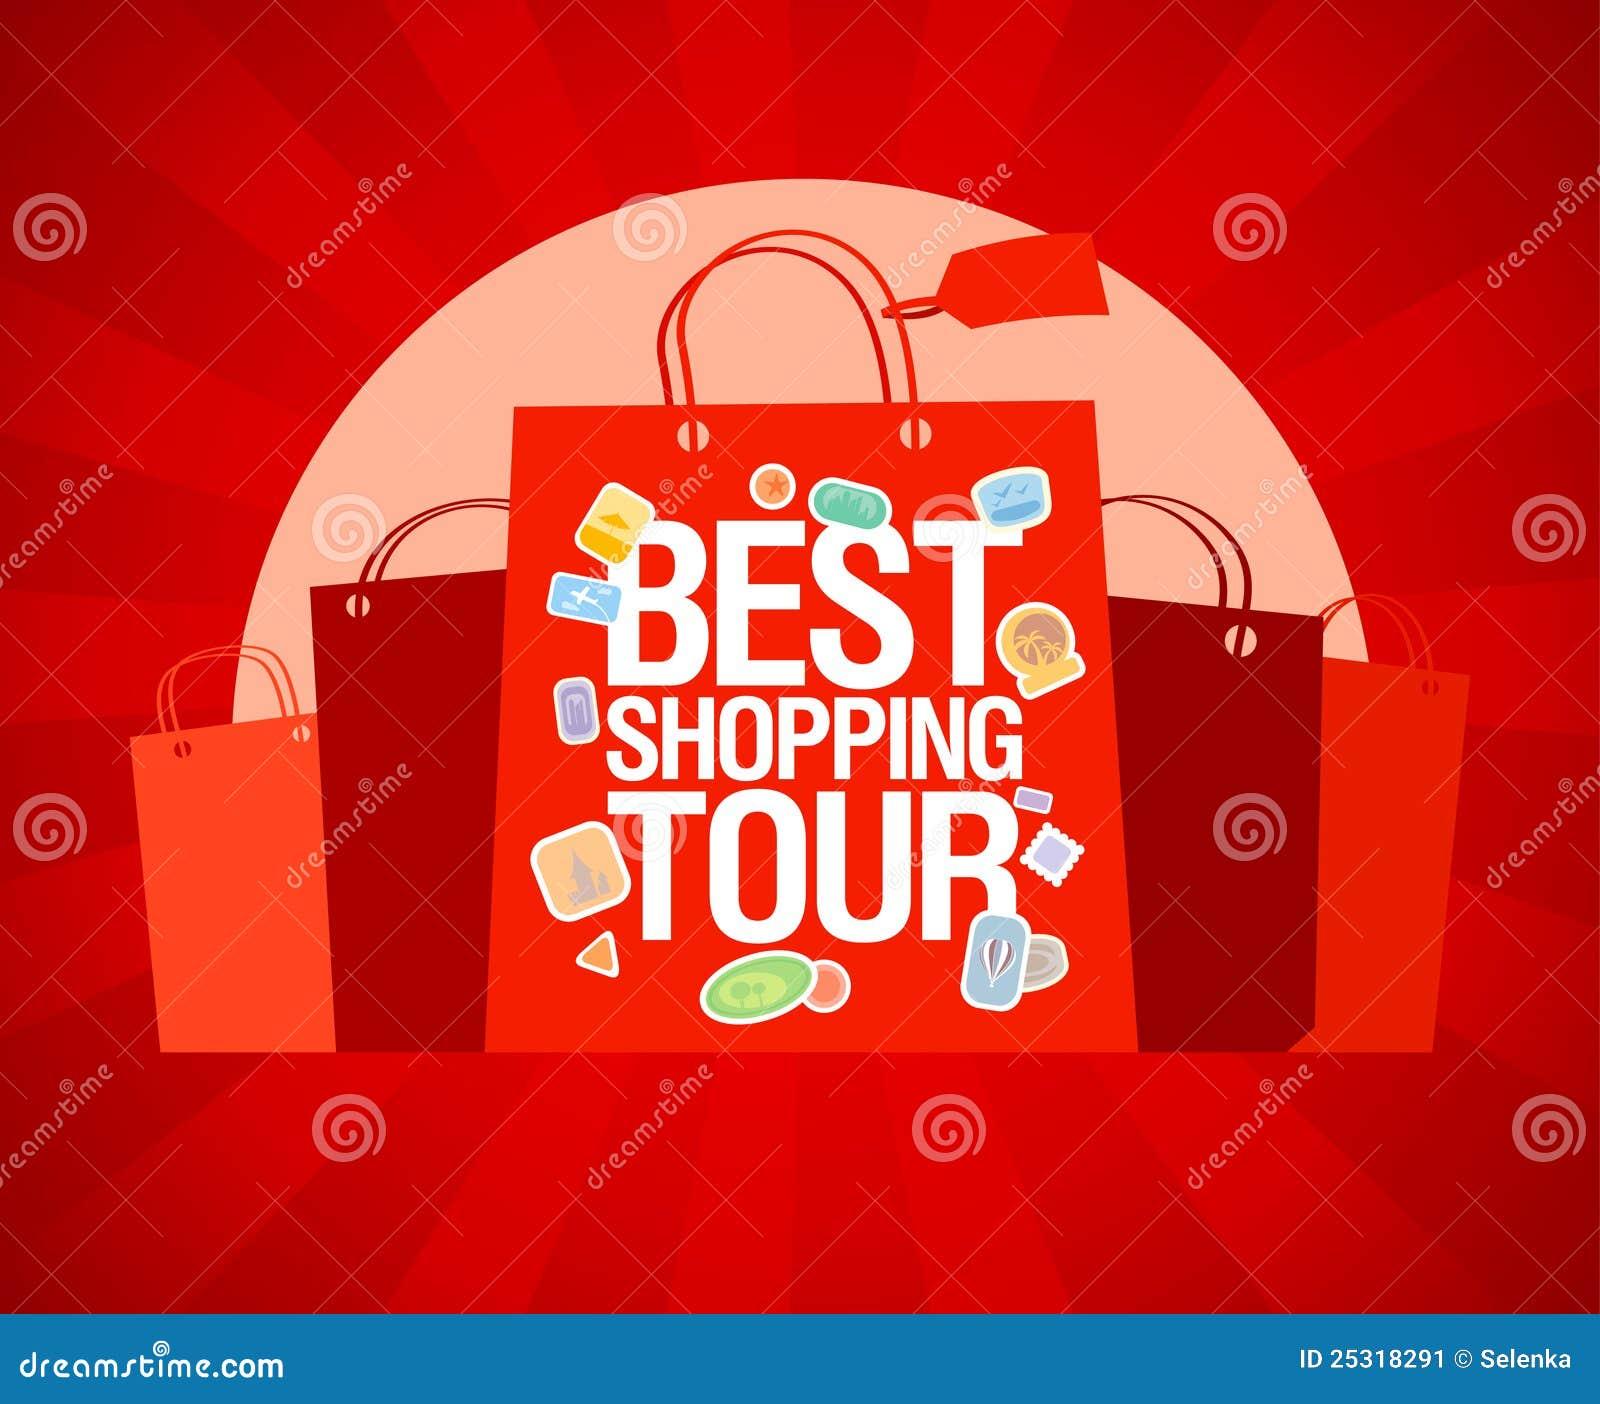 best shopping tour design template  stock vector